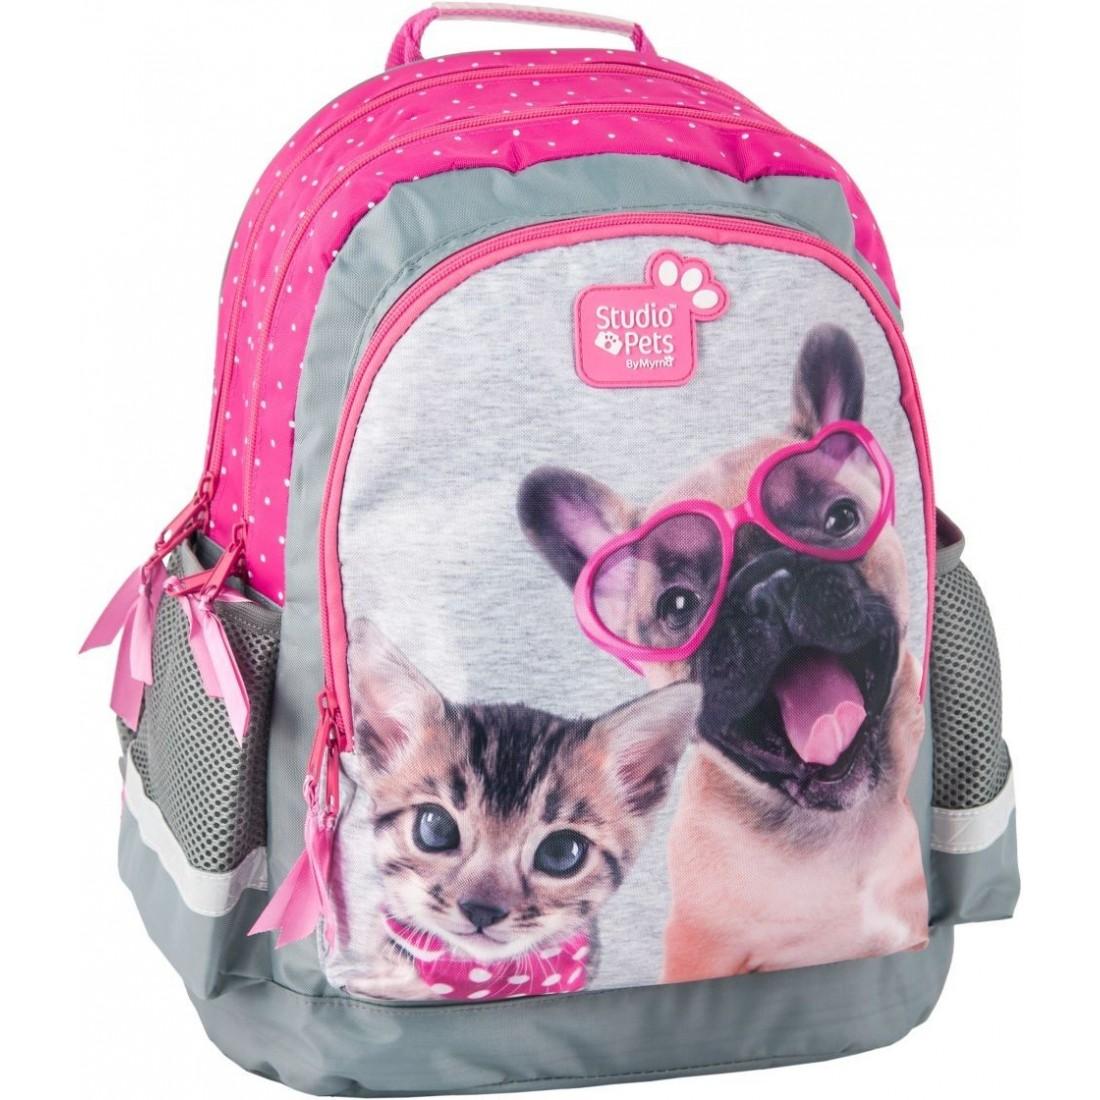 c41577e692017 Plecak szkolny z psem i kotem Studio Pets w kropki - plecak-tornister.pl